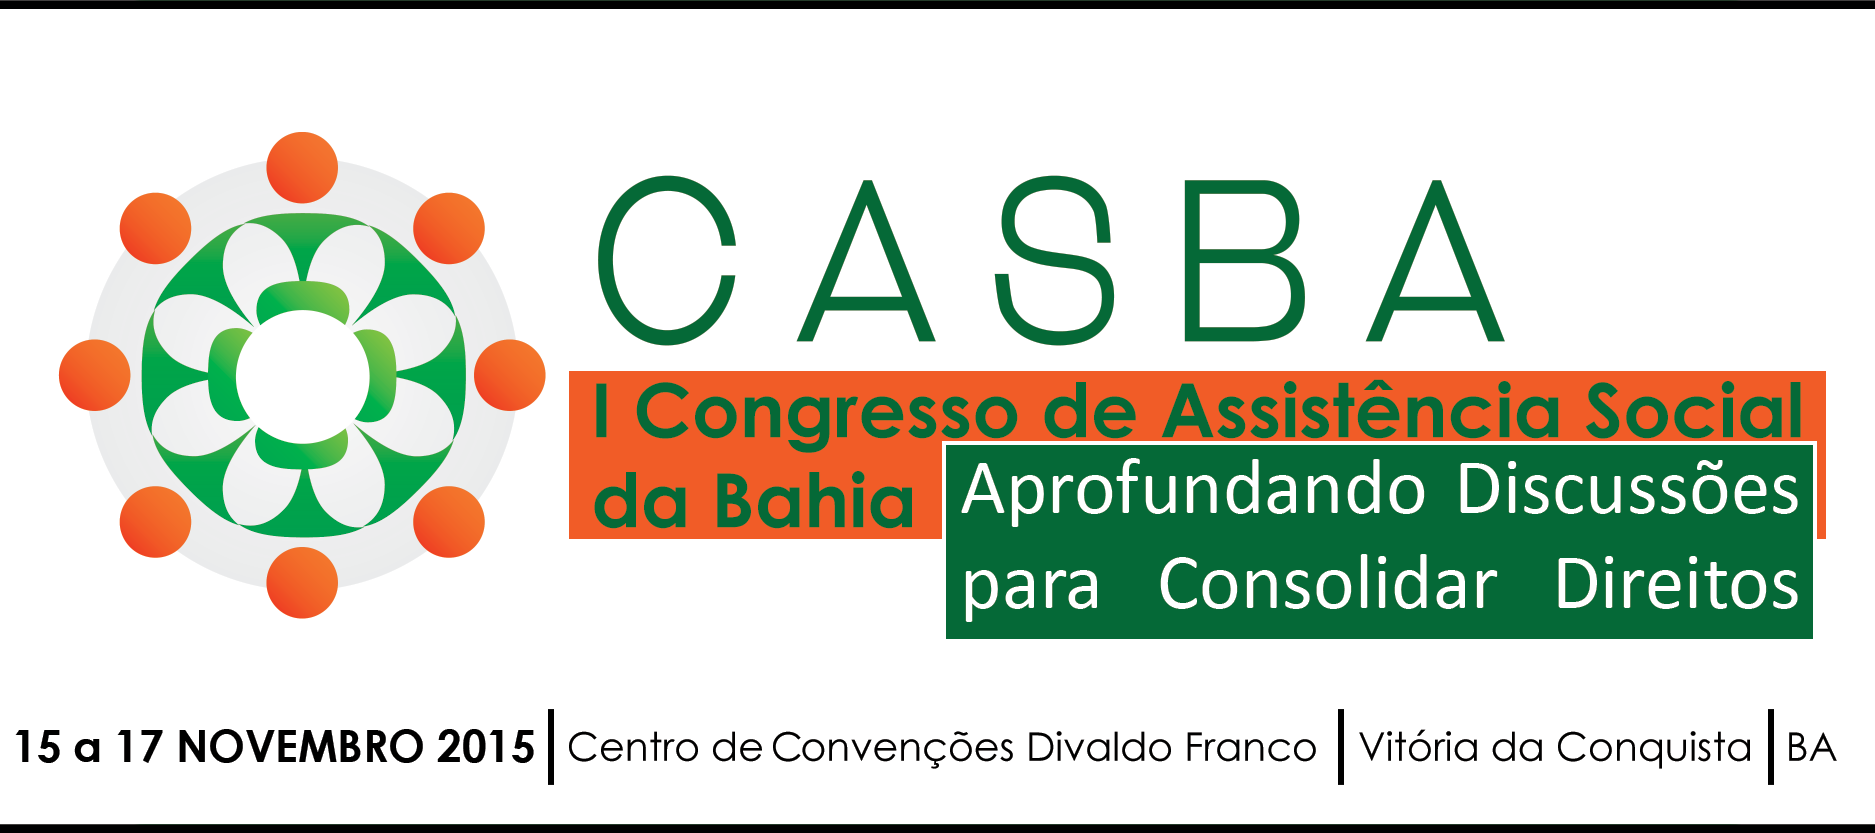 congresso assistencia social bahia 01